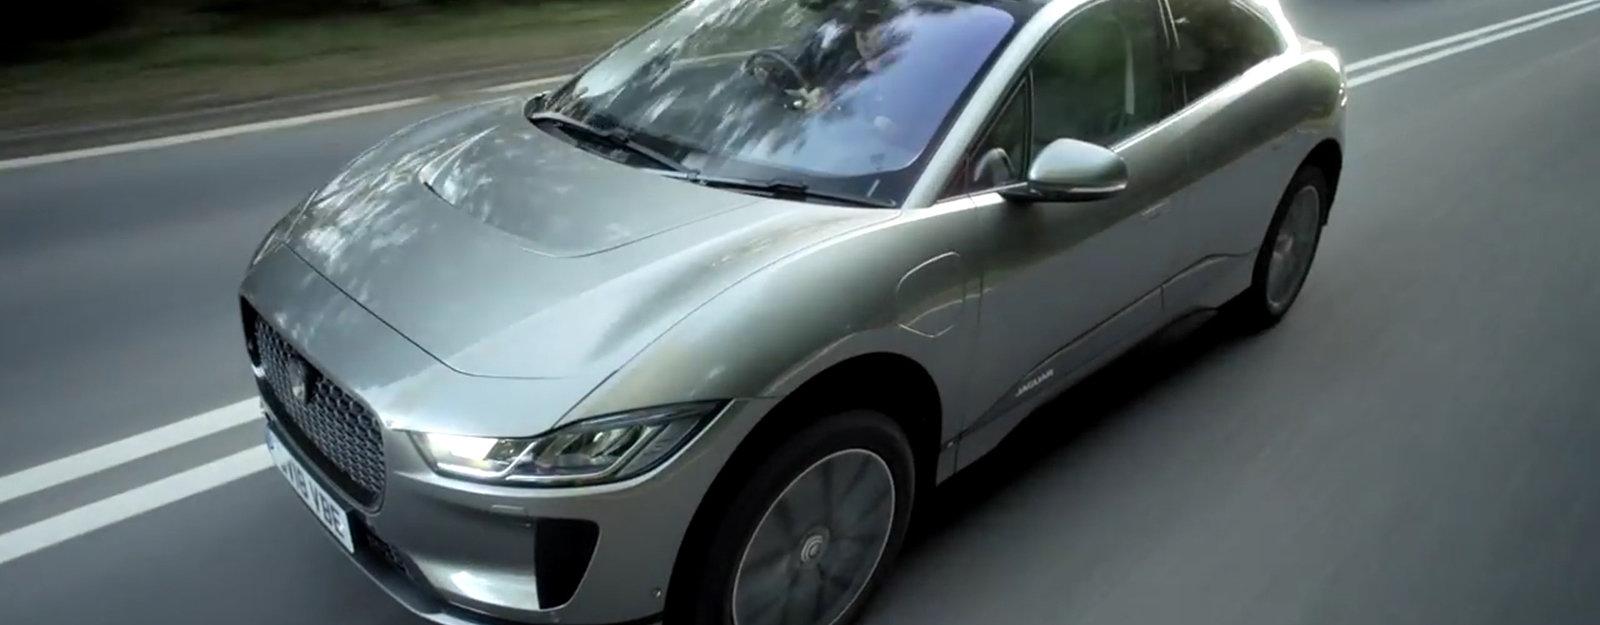 Jaguar Demonstrates the Artificial, Safety-Minded Sounds